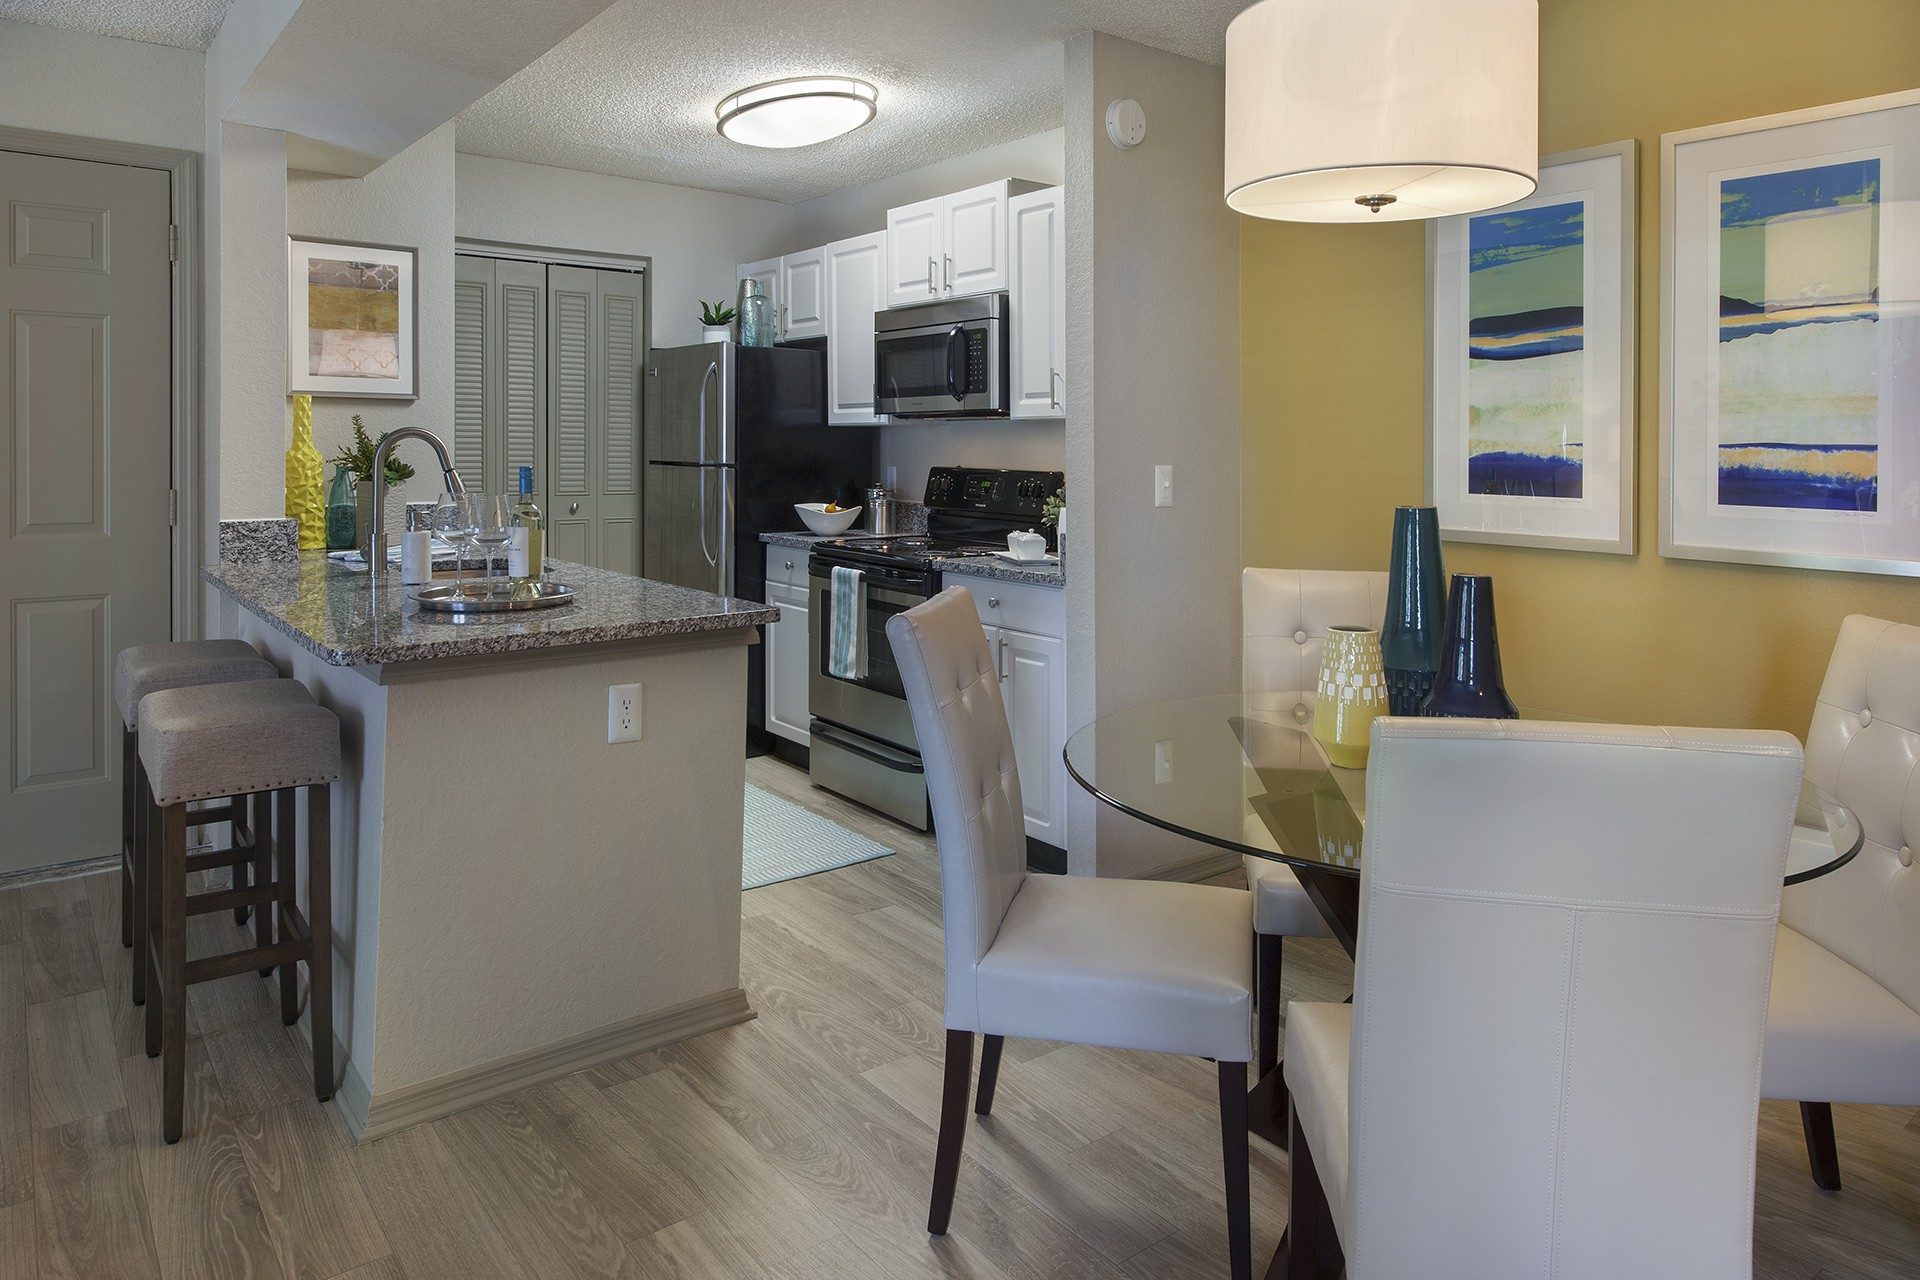 1020 at Winter Springs Apartments rental